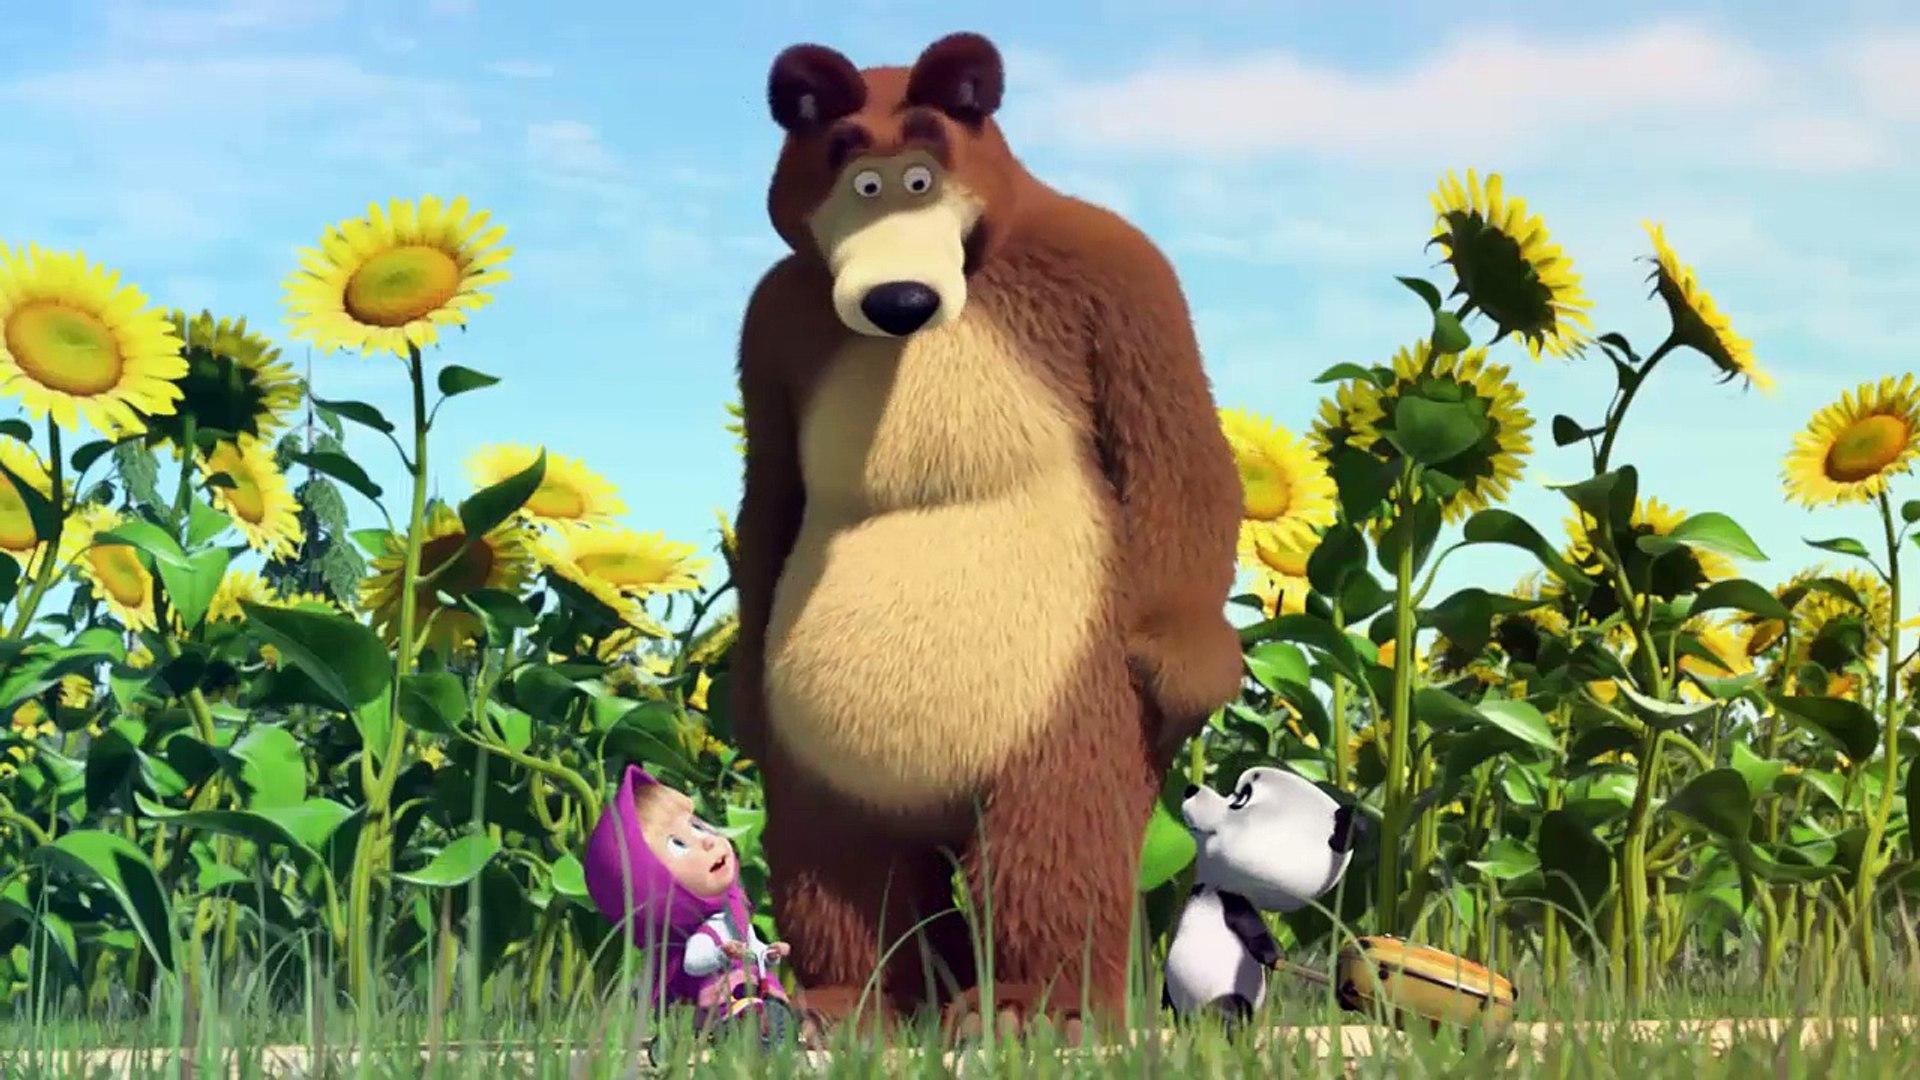 Masha Eo Urso Episodio 15 Priminho Desenho Animado Novo